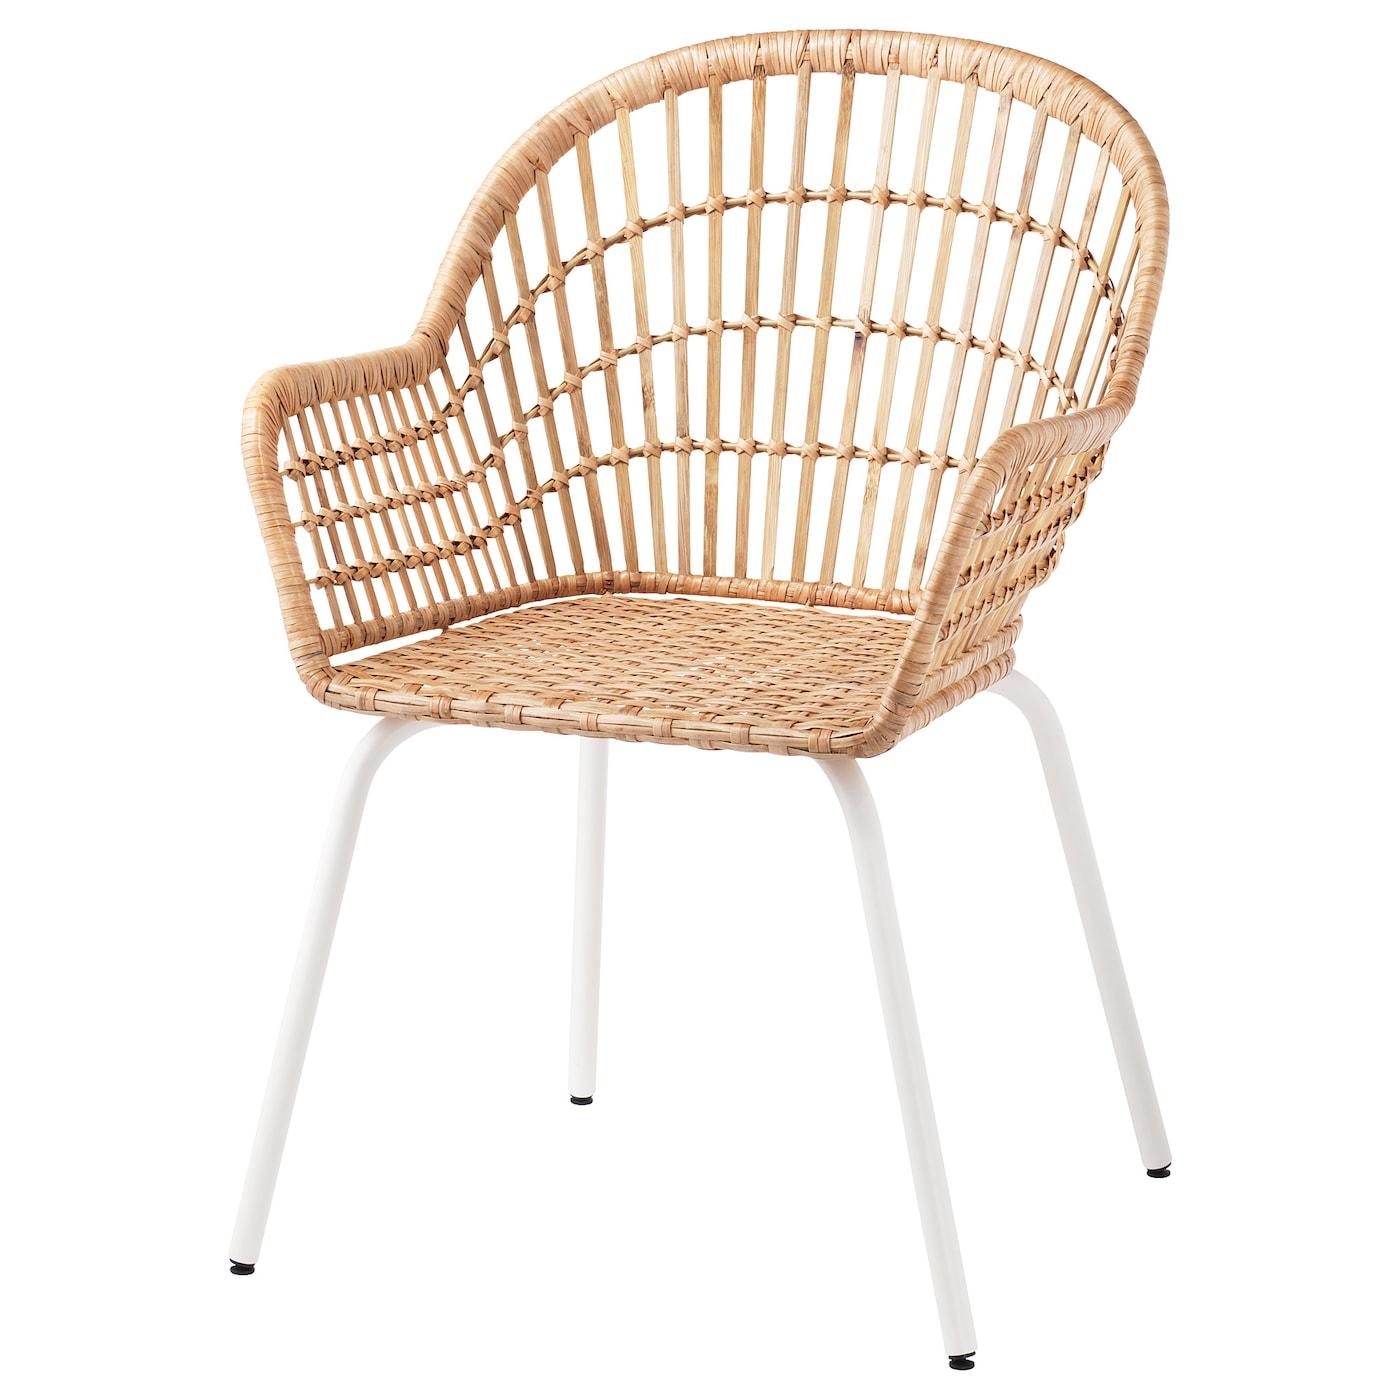 ve-armchair-rattan-white__0672929_PE716967_S5